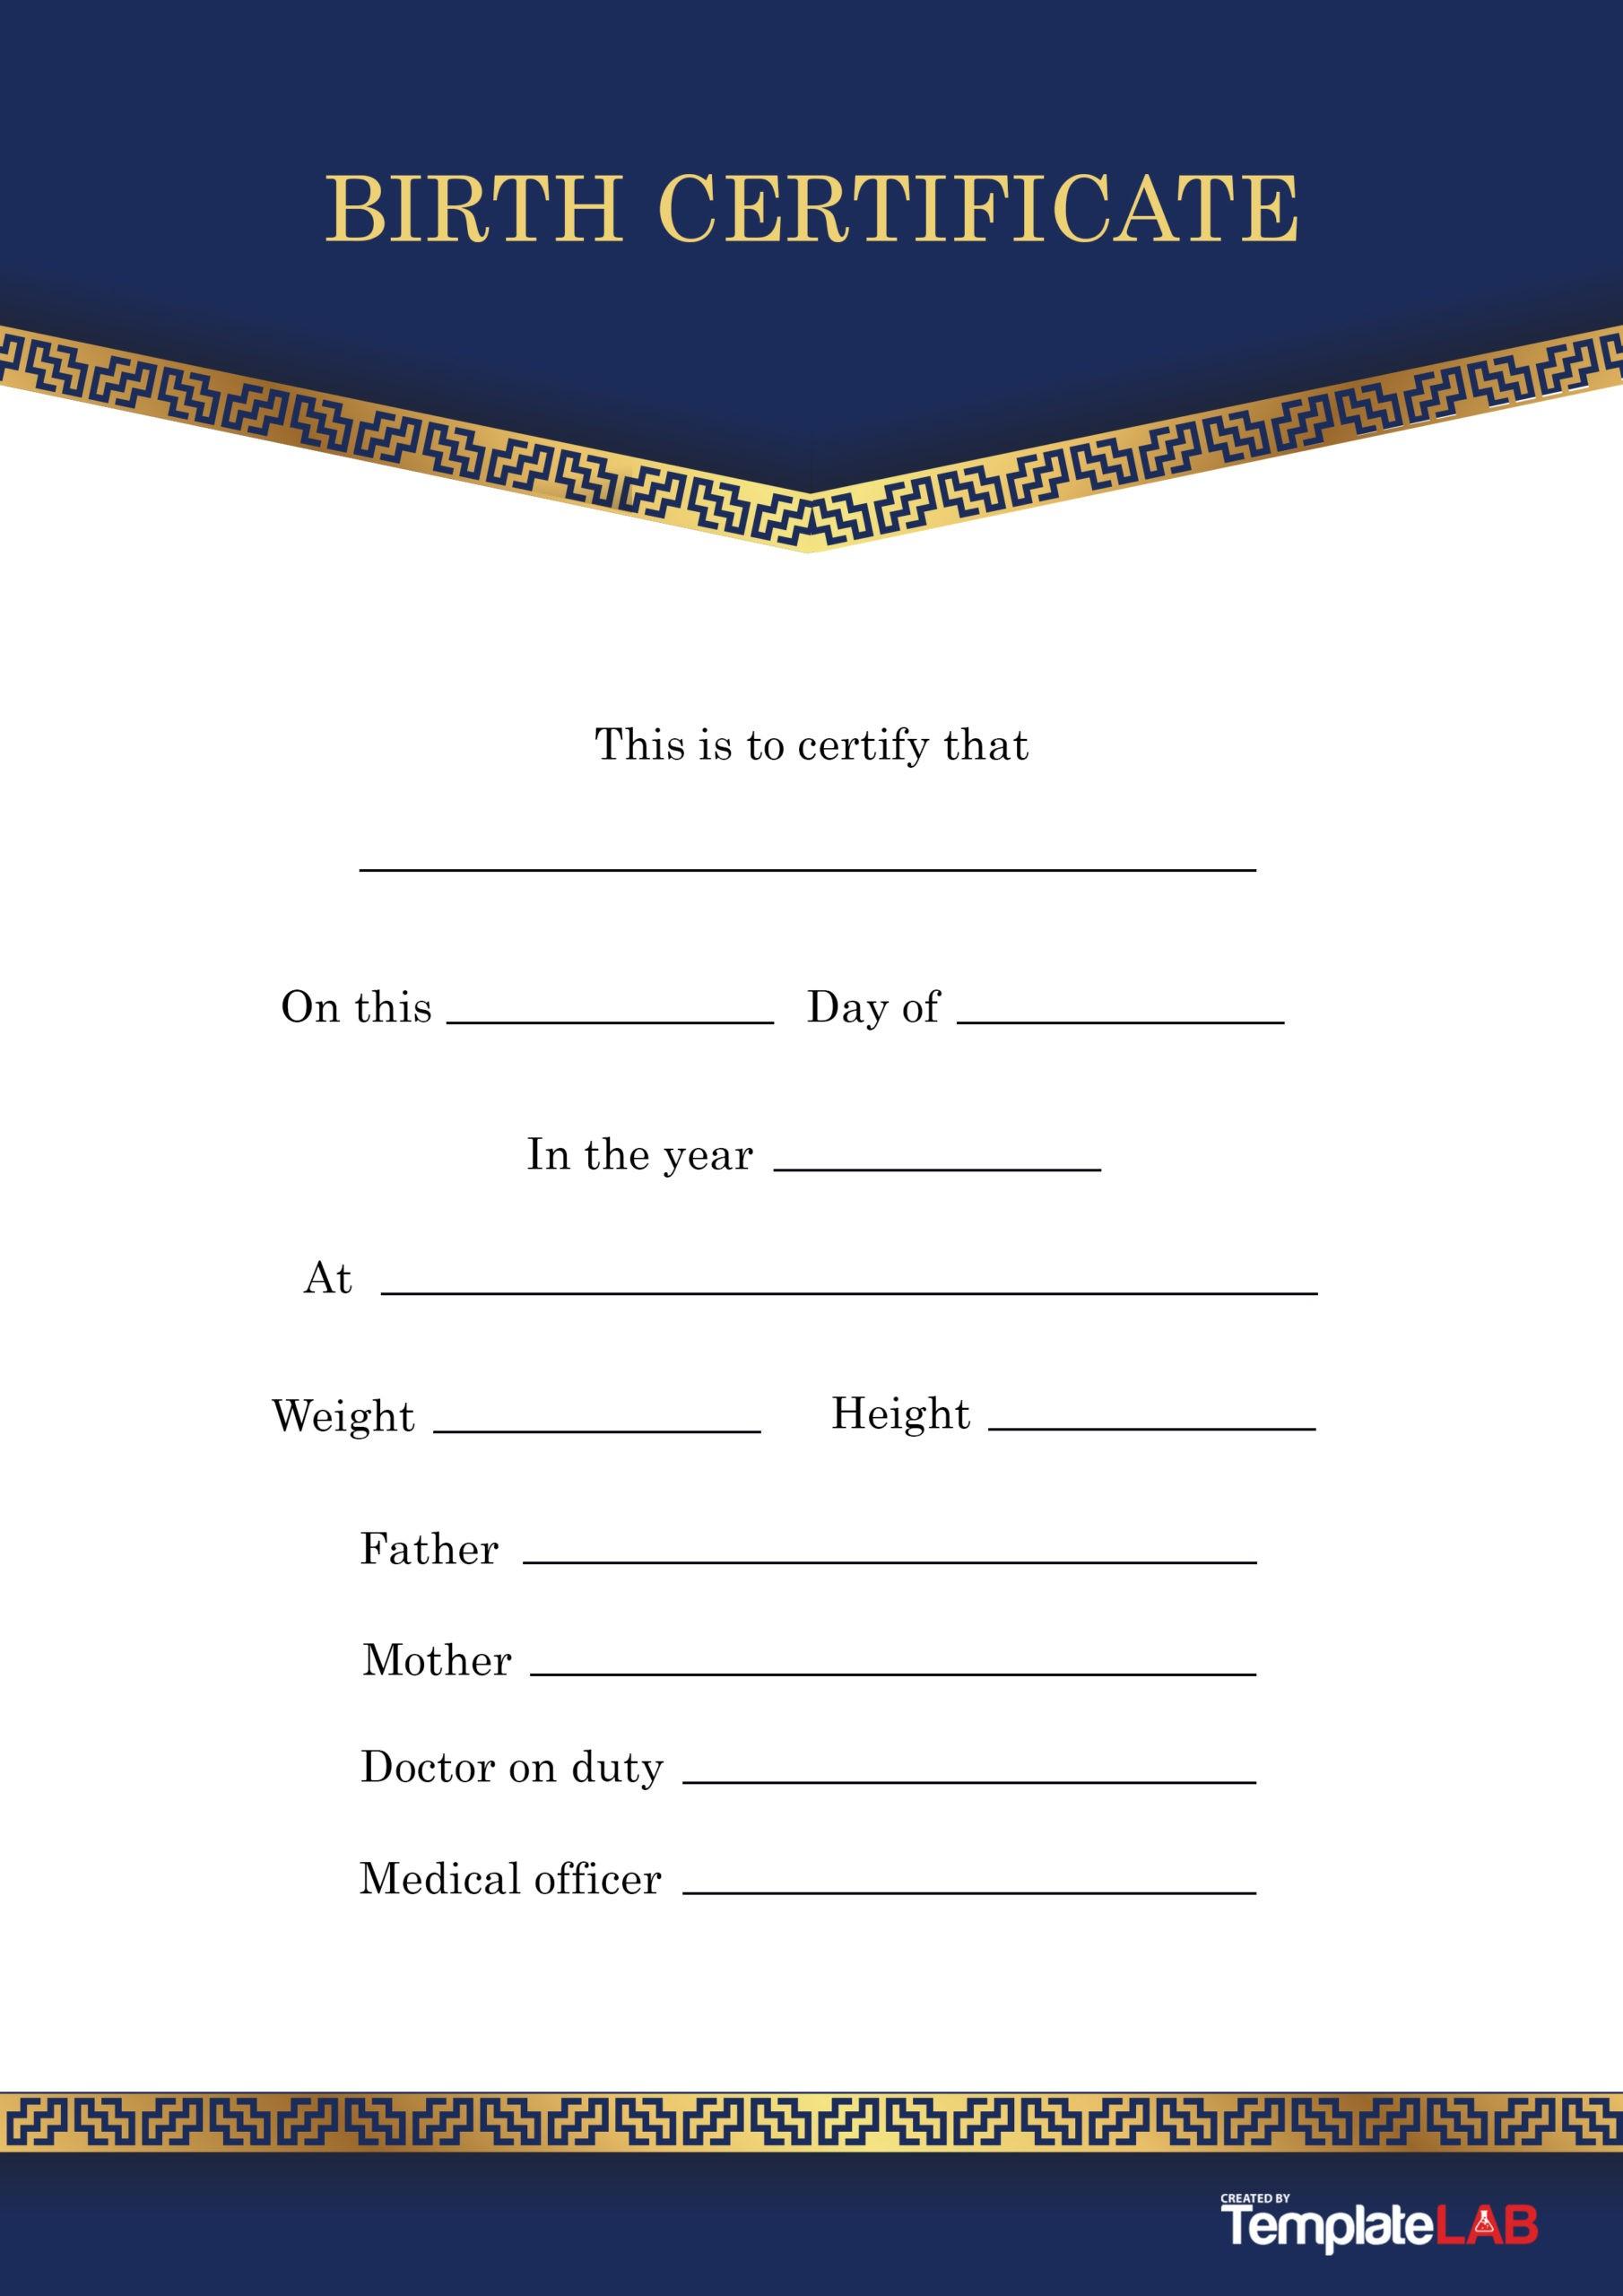 Free Birth Certificate Template 7